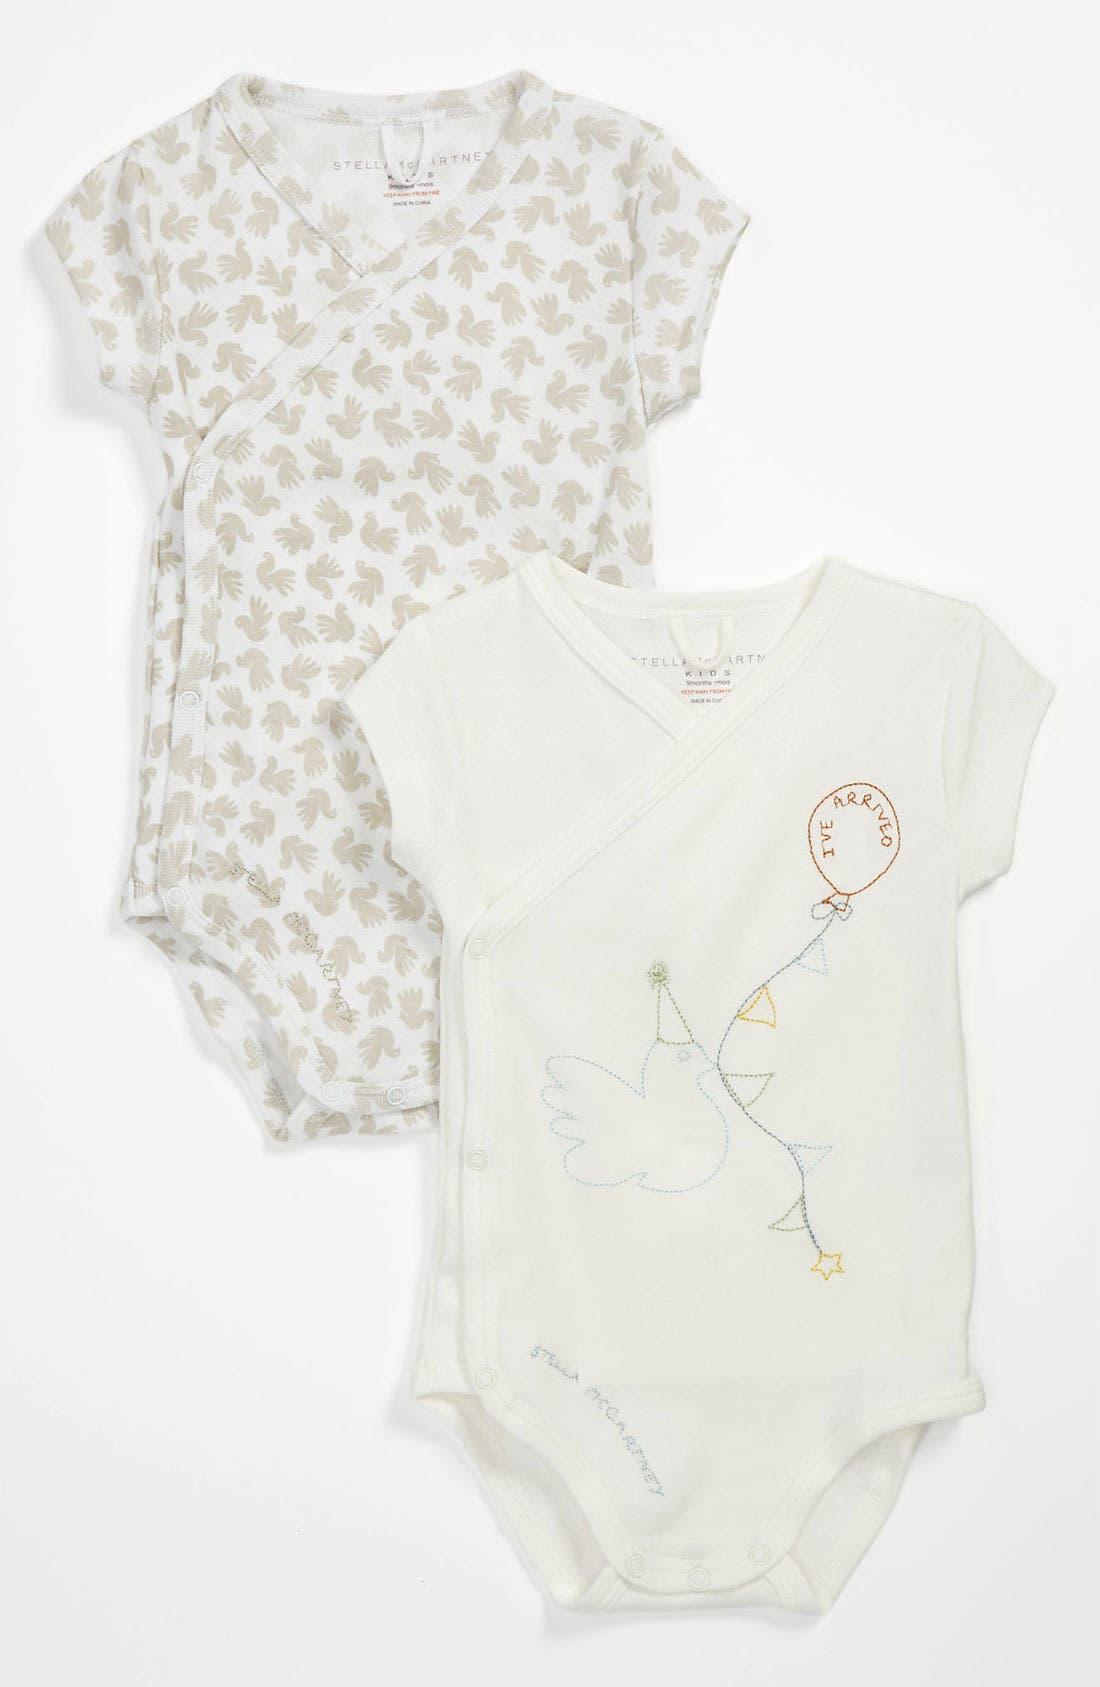 Main Image - Stella McCartney Kids 'Birdie Baby' Bodysuit Gift Set (Set of 2) (Baby)